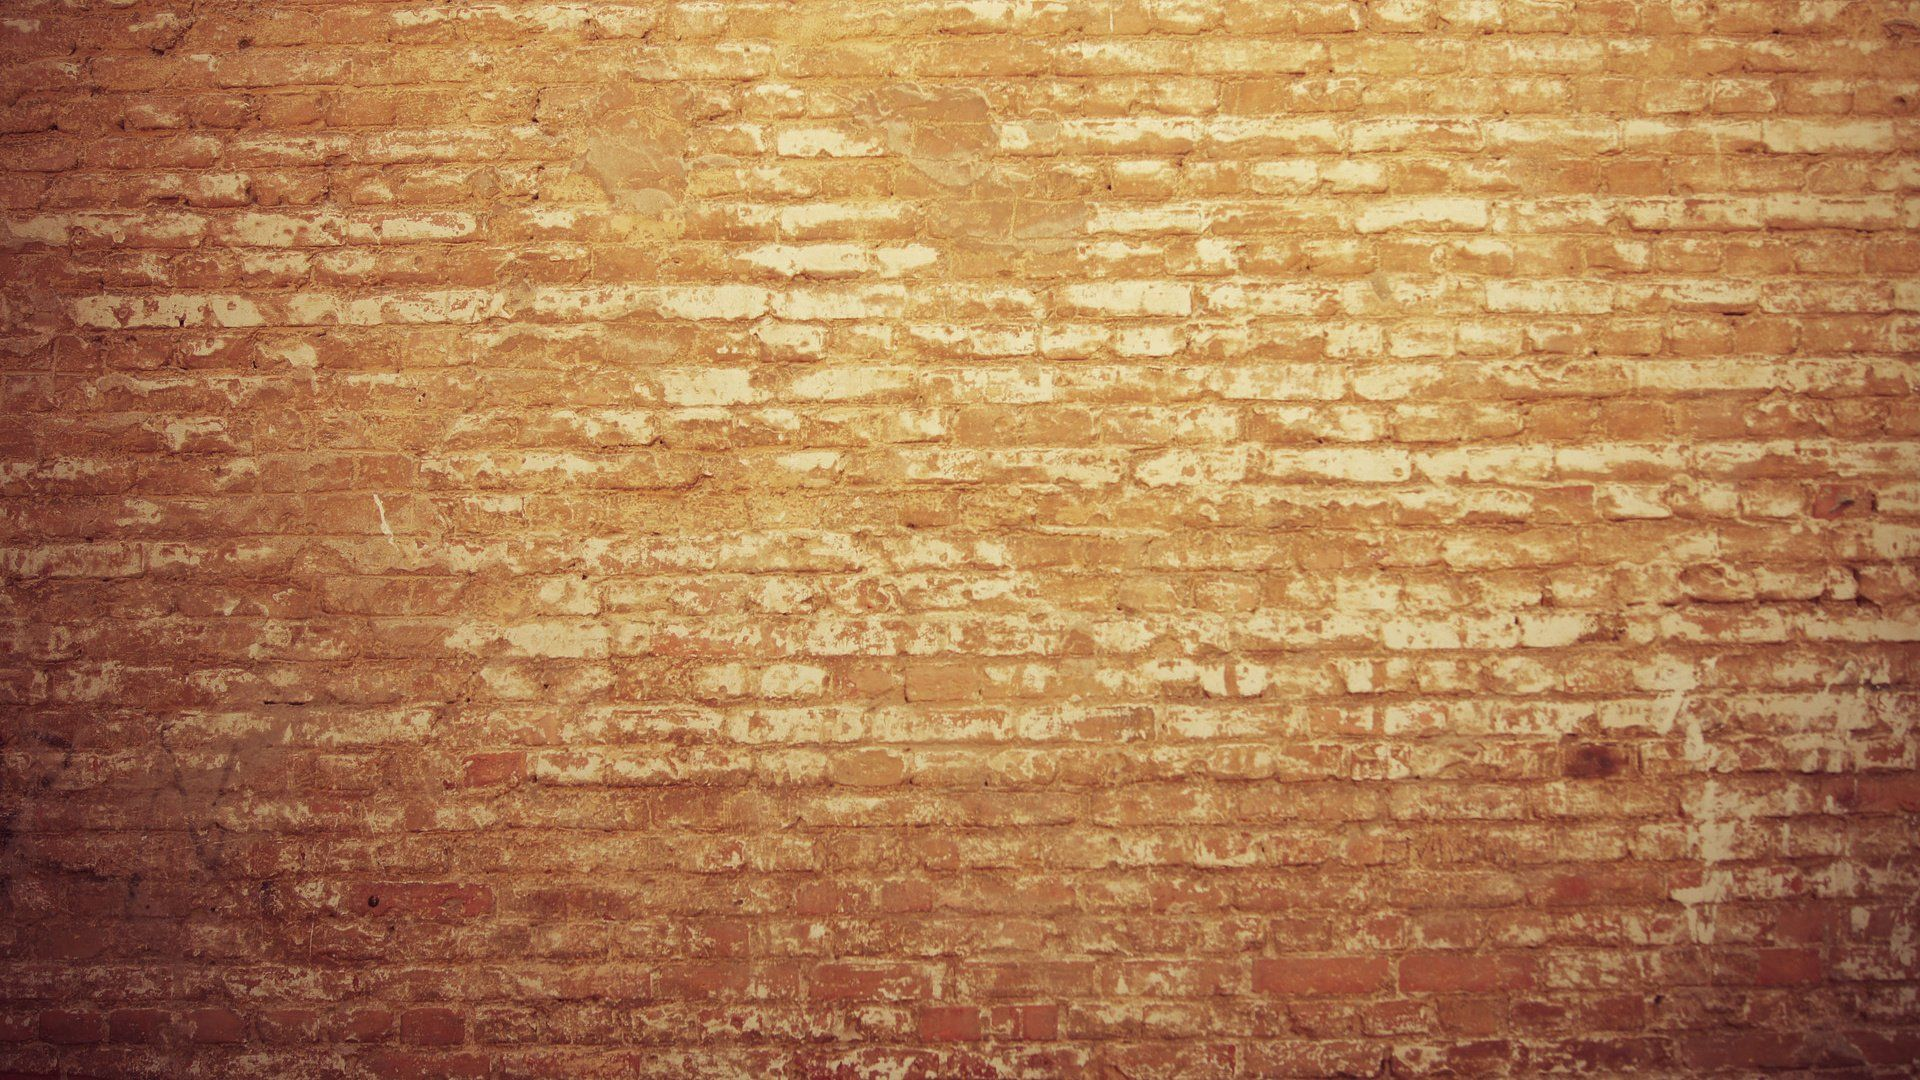 Wall Hd 1080p wallpaper